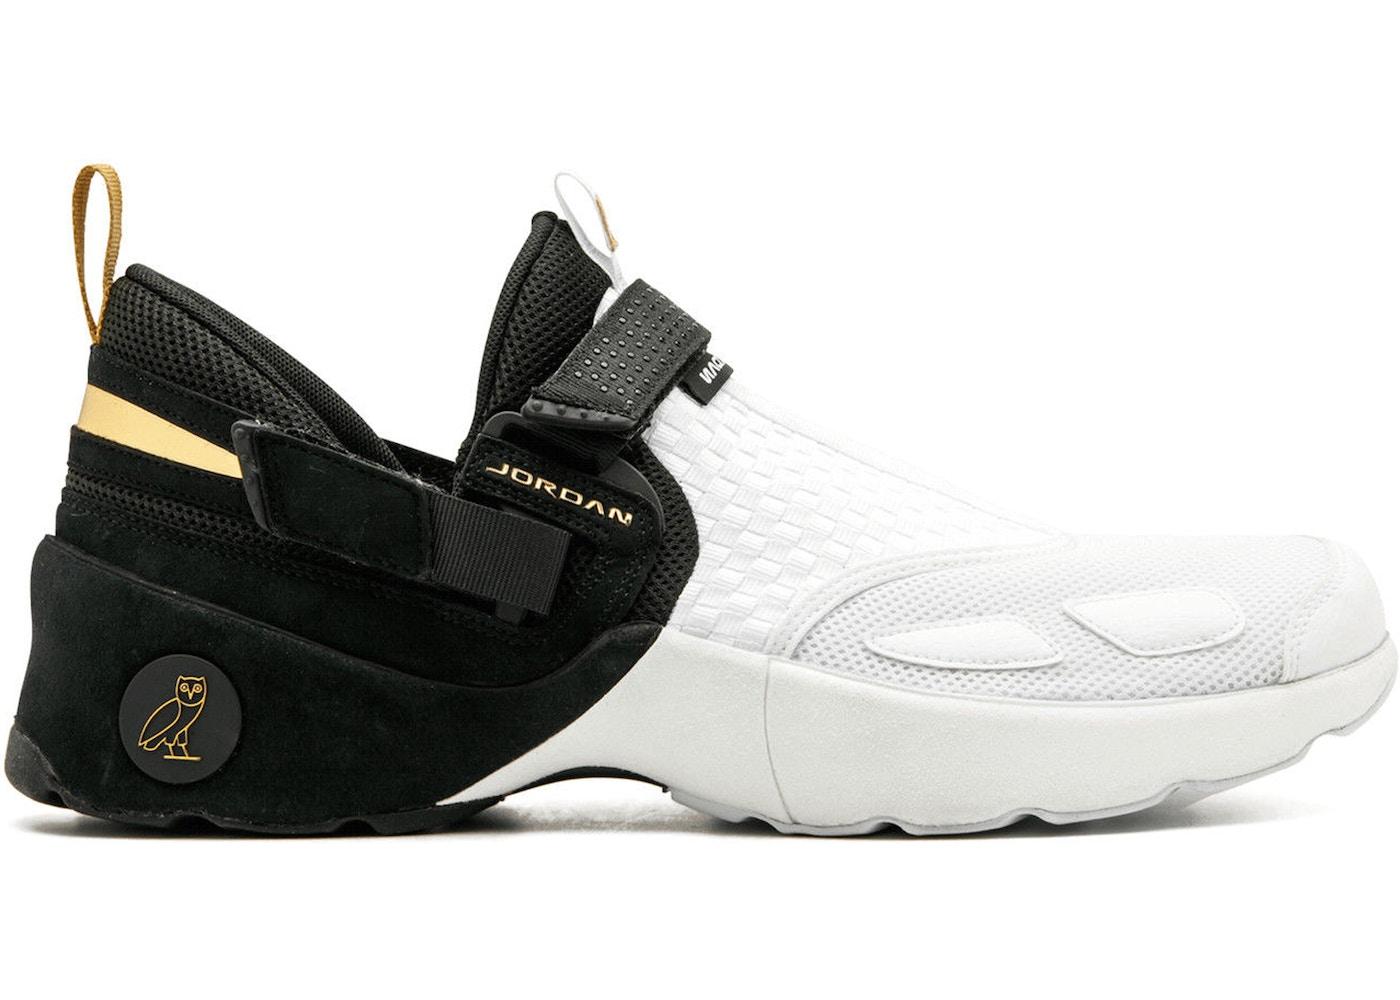 purchase cheap 07cfc 4a9ac Jordan Trunner LX OVO Black White - AH9110-023